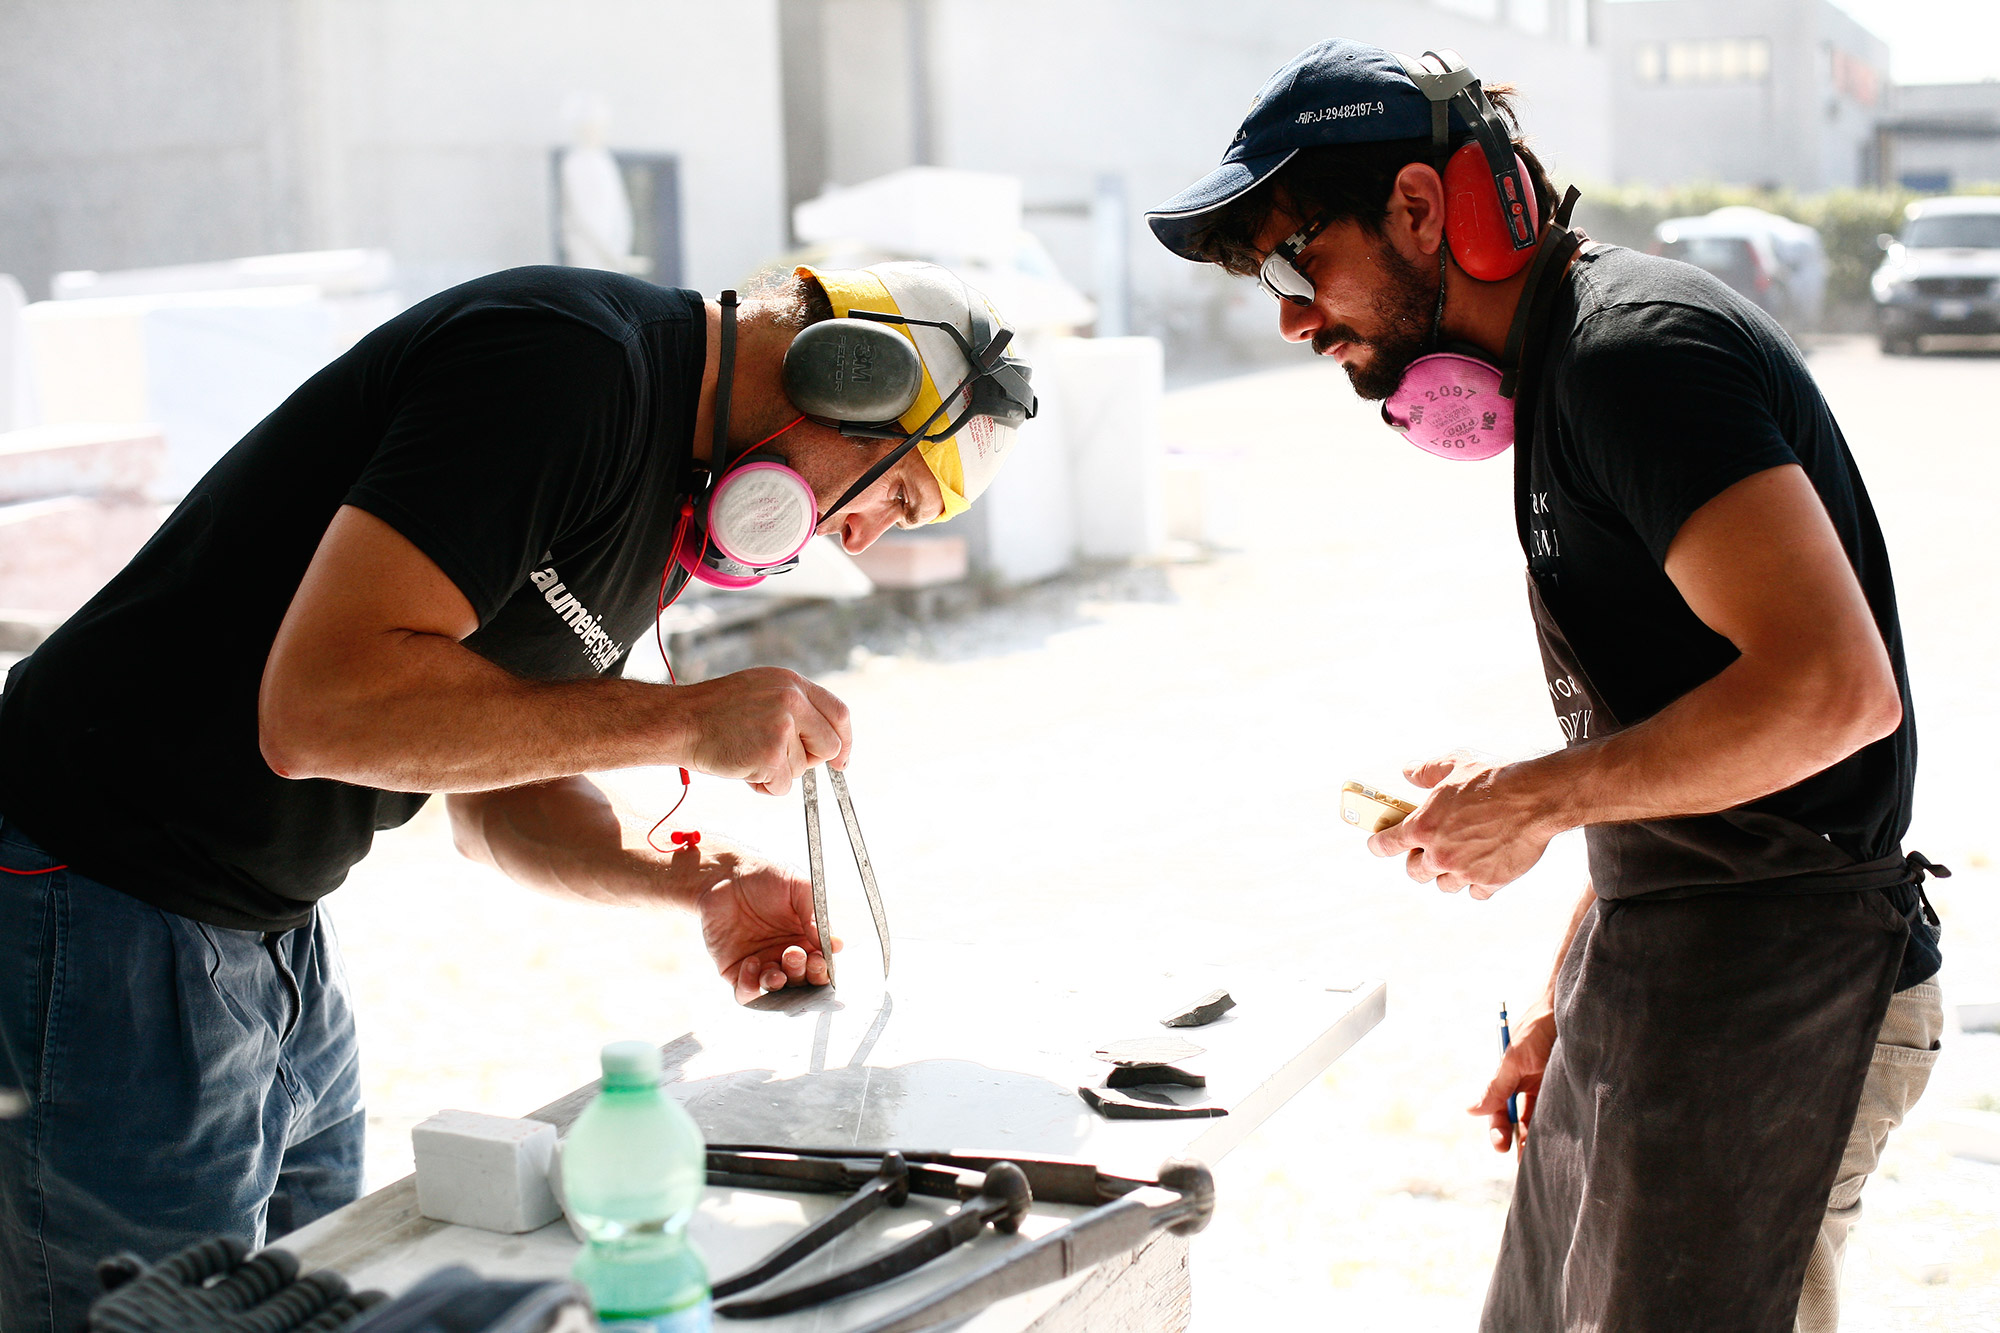 New-York-Academy-of-Art-Carrara-Residency-Josh-Henderson-Marco-Palli20171213_0140.jpg